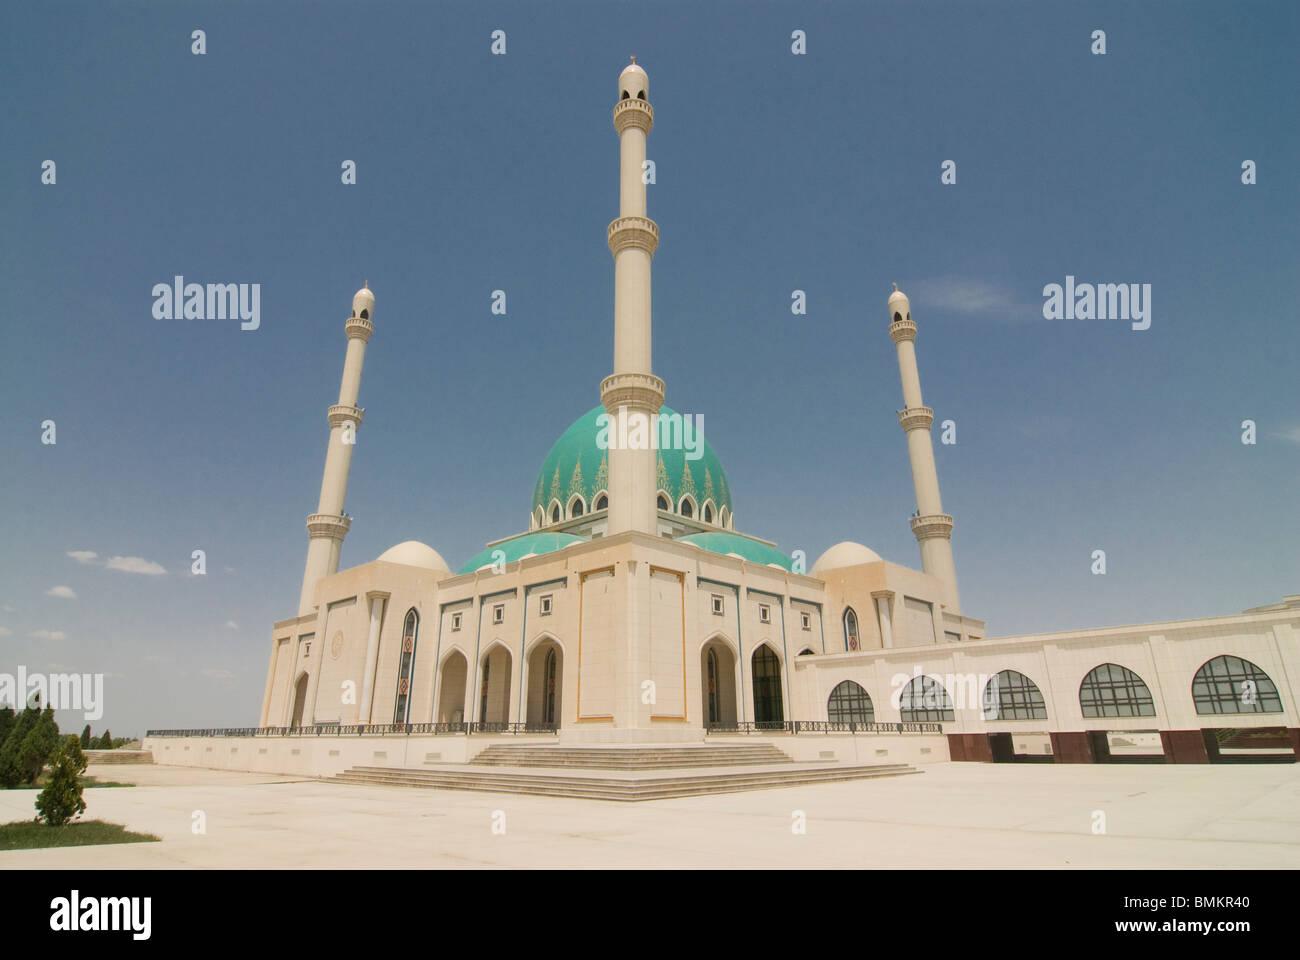 Saparmurat Haji Mosque, Turkmenistan - Stock Image